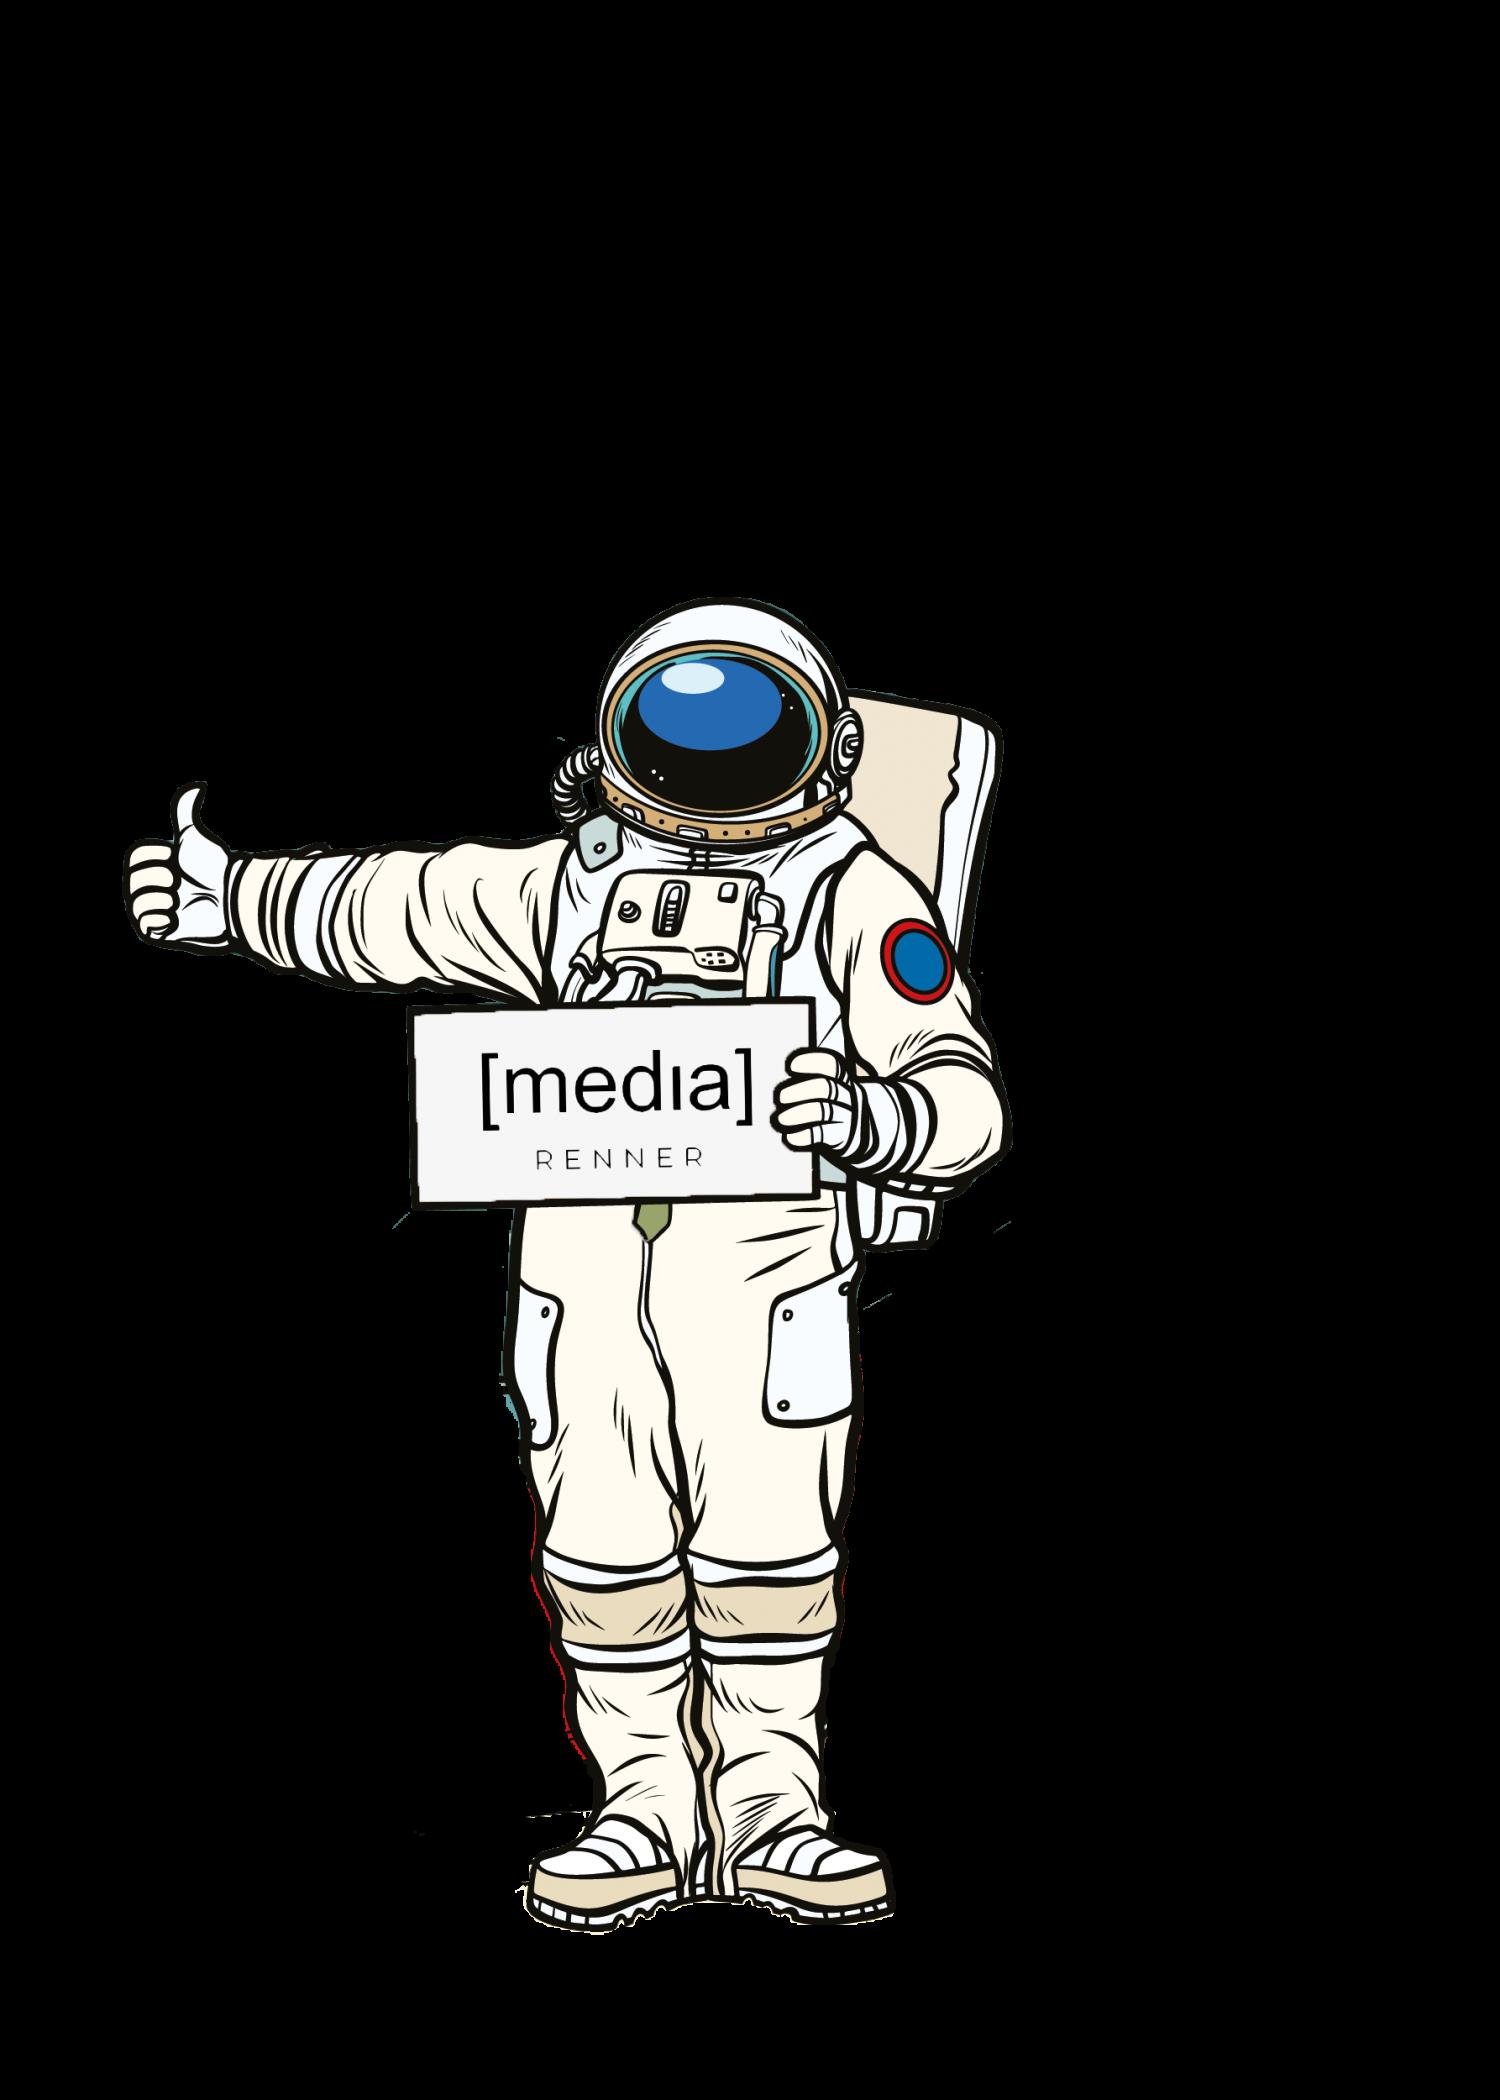 Media Renner Astronaut